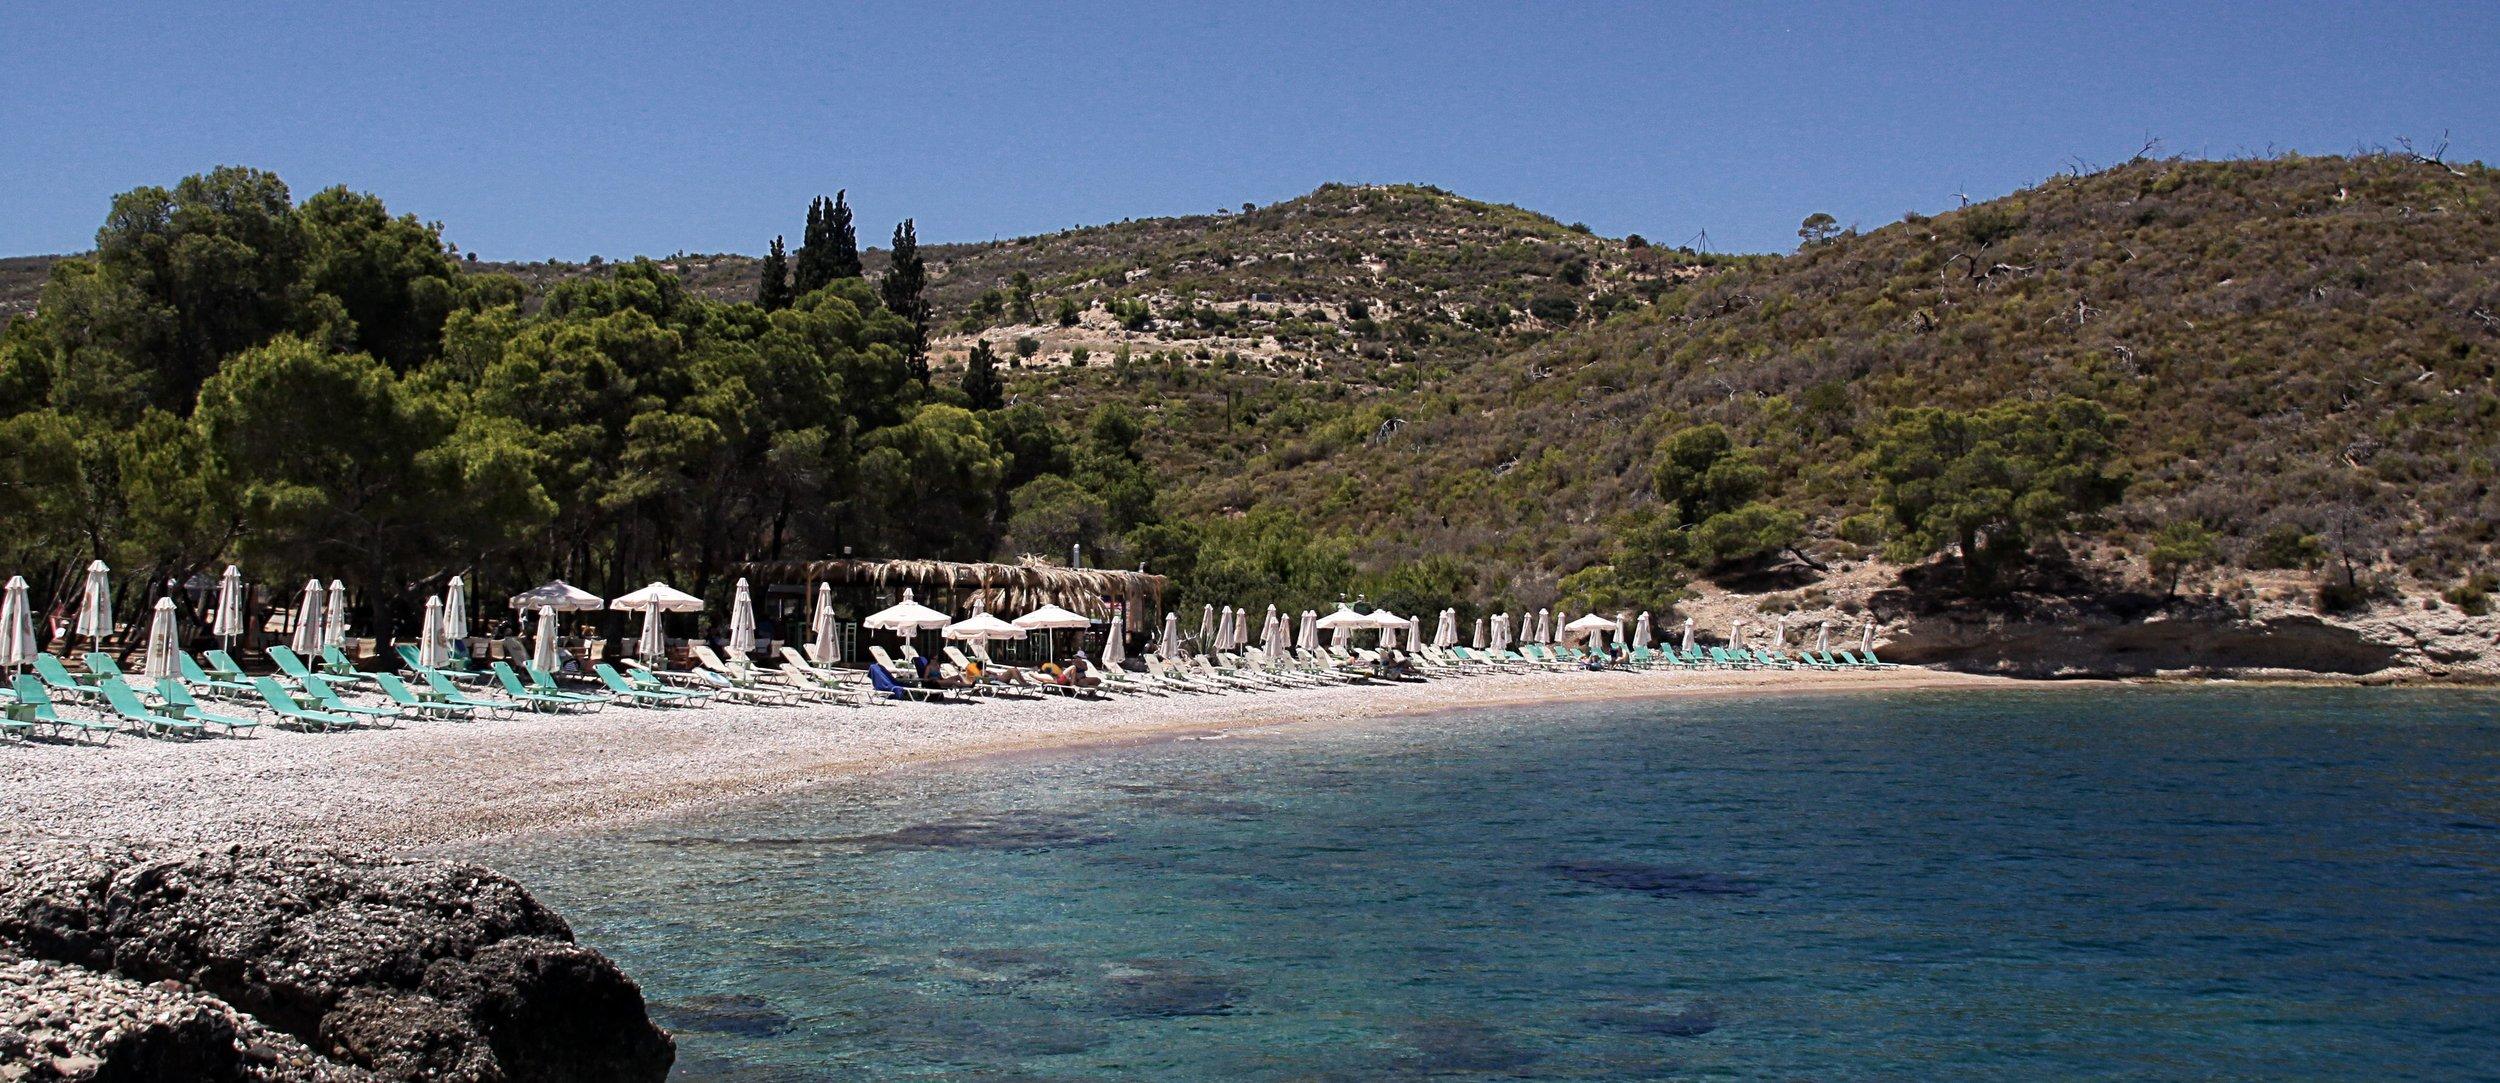 Spetses Vrelos beach 3_HDR.jpg